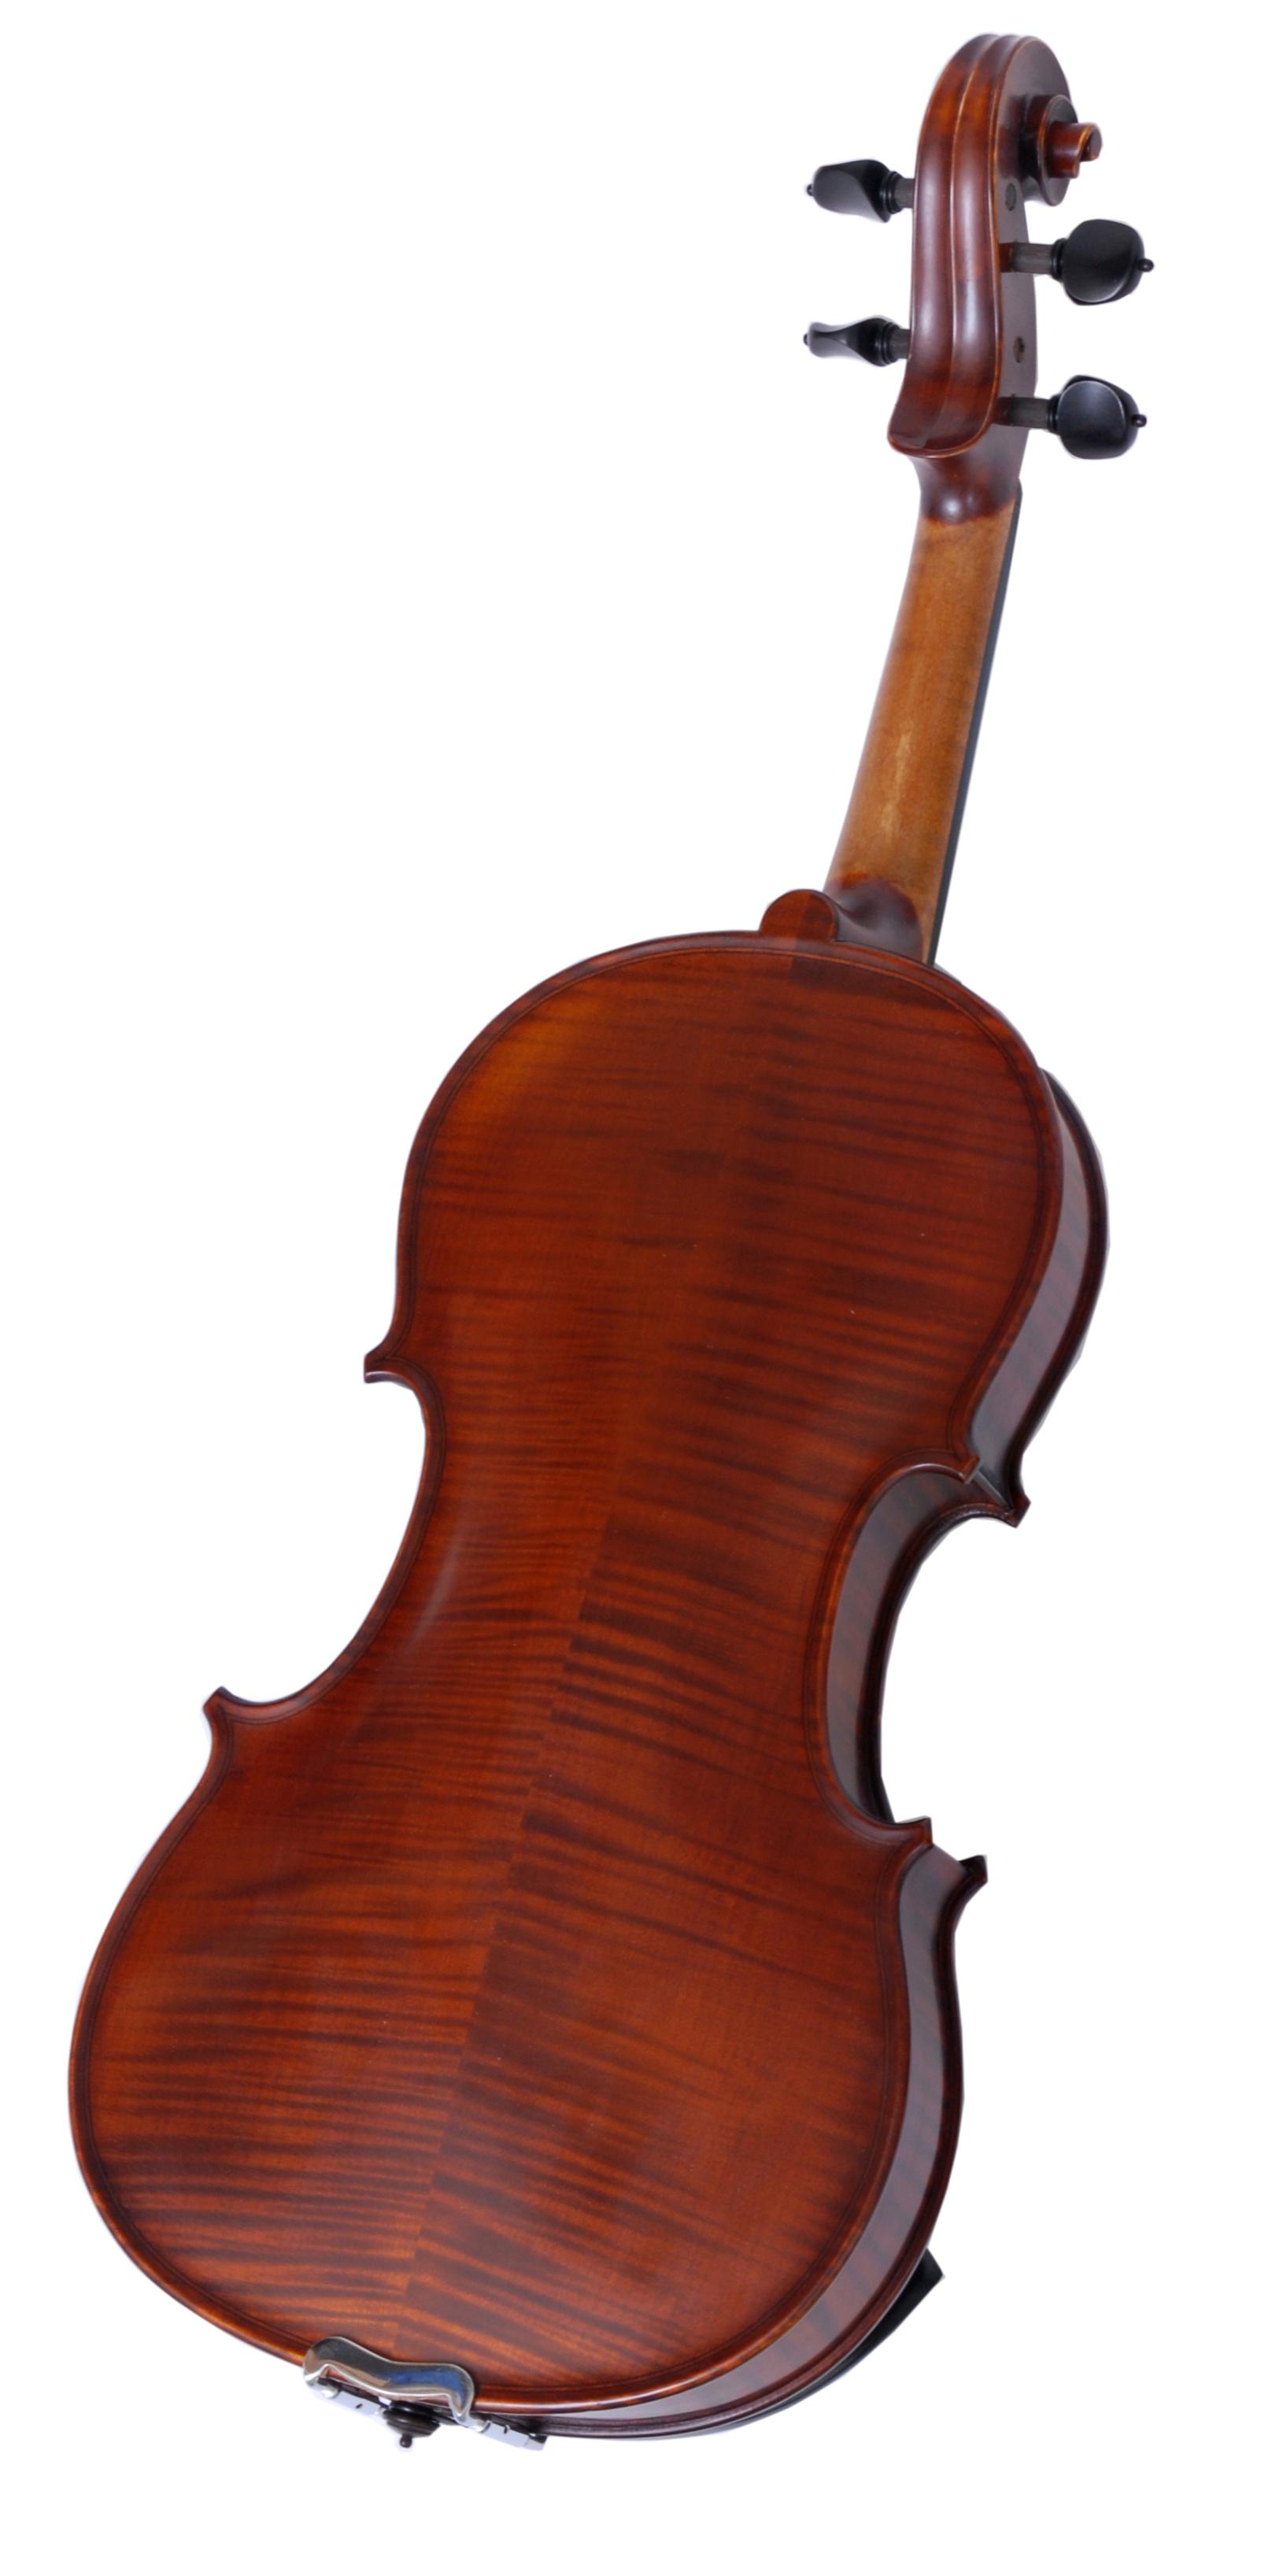 Erwin+Otto+1240+R+violin+back.jpg